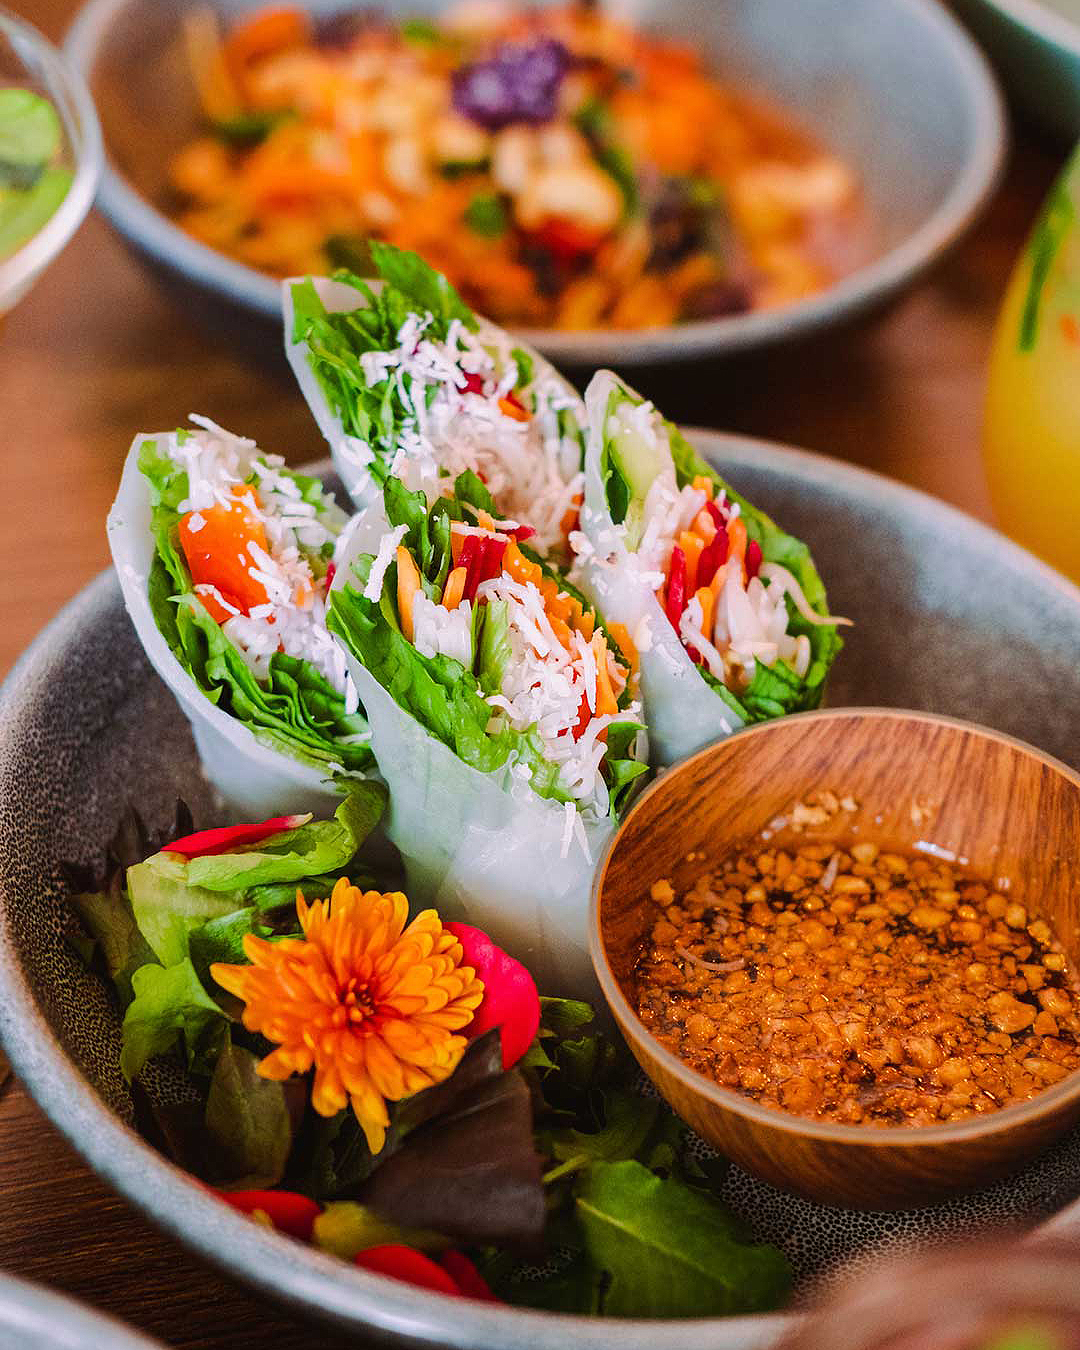 Spring rolls from Khu Khu.